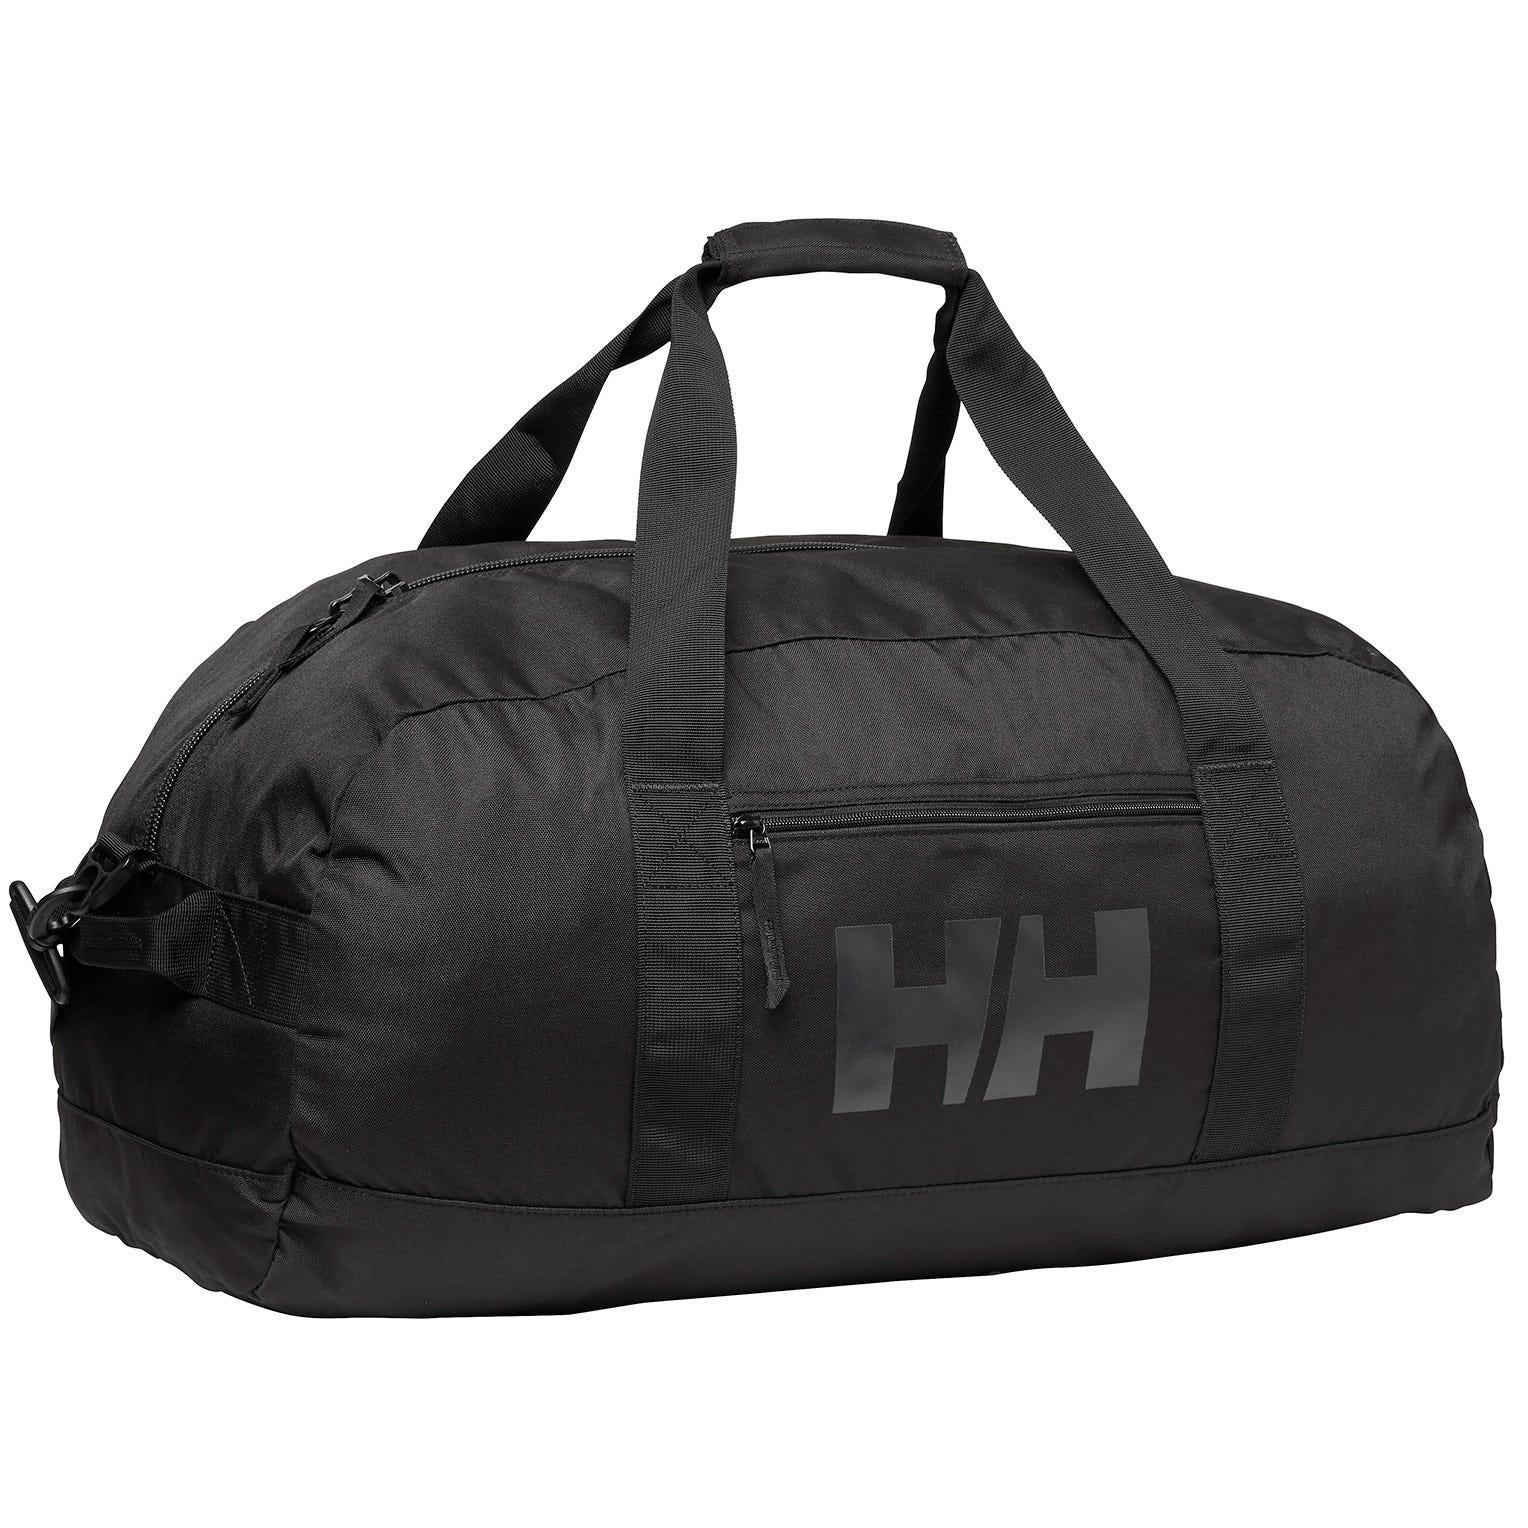 Helly Hansen Sport Durable Duffel Bag 50l Black STD